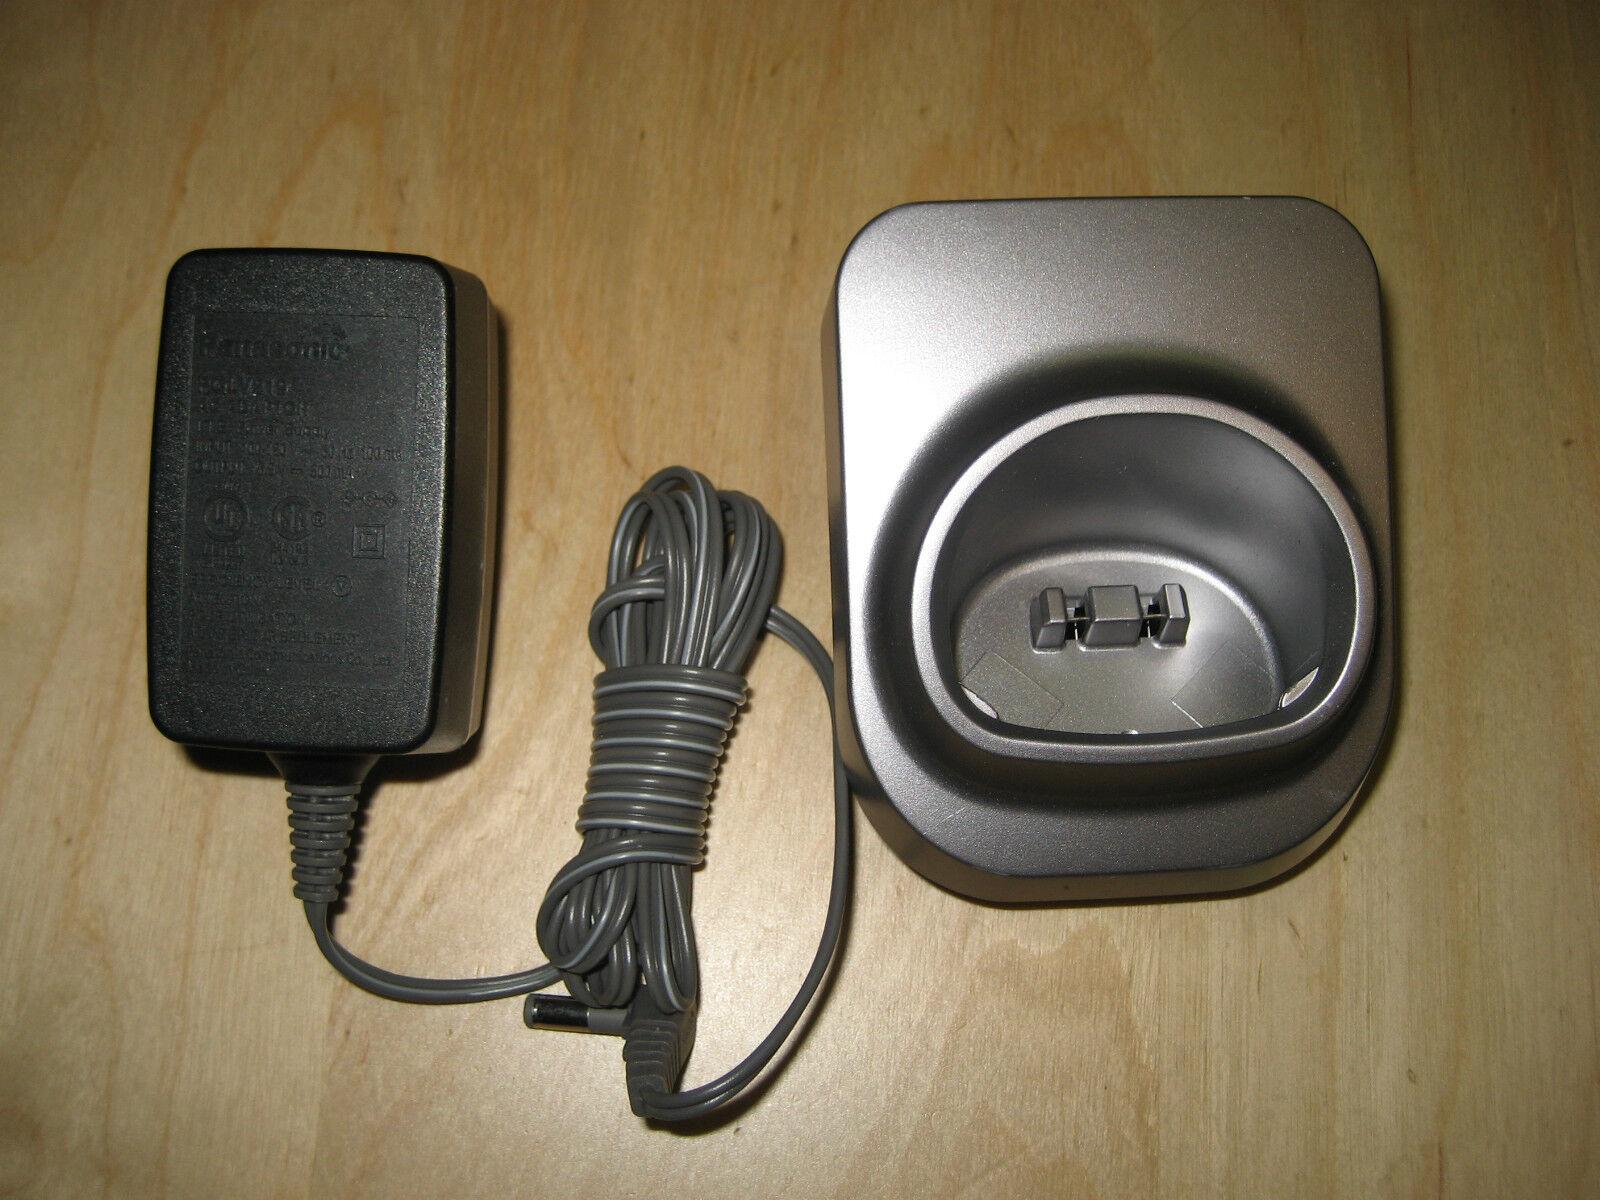 Panasonic cordless phone ac adapter - Cheap littlest pet